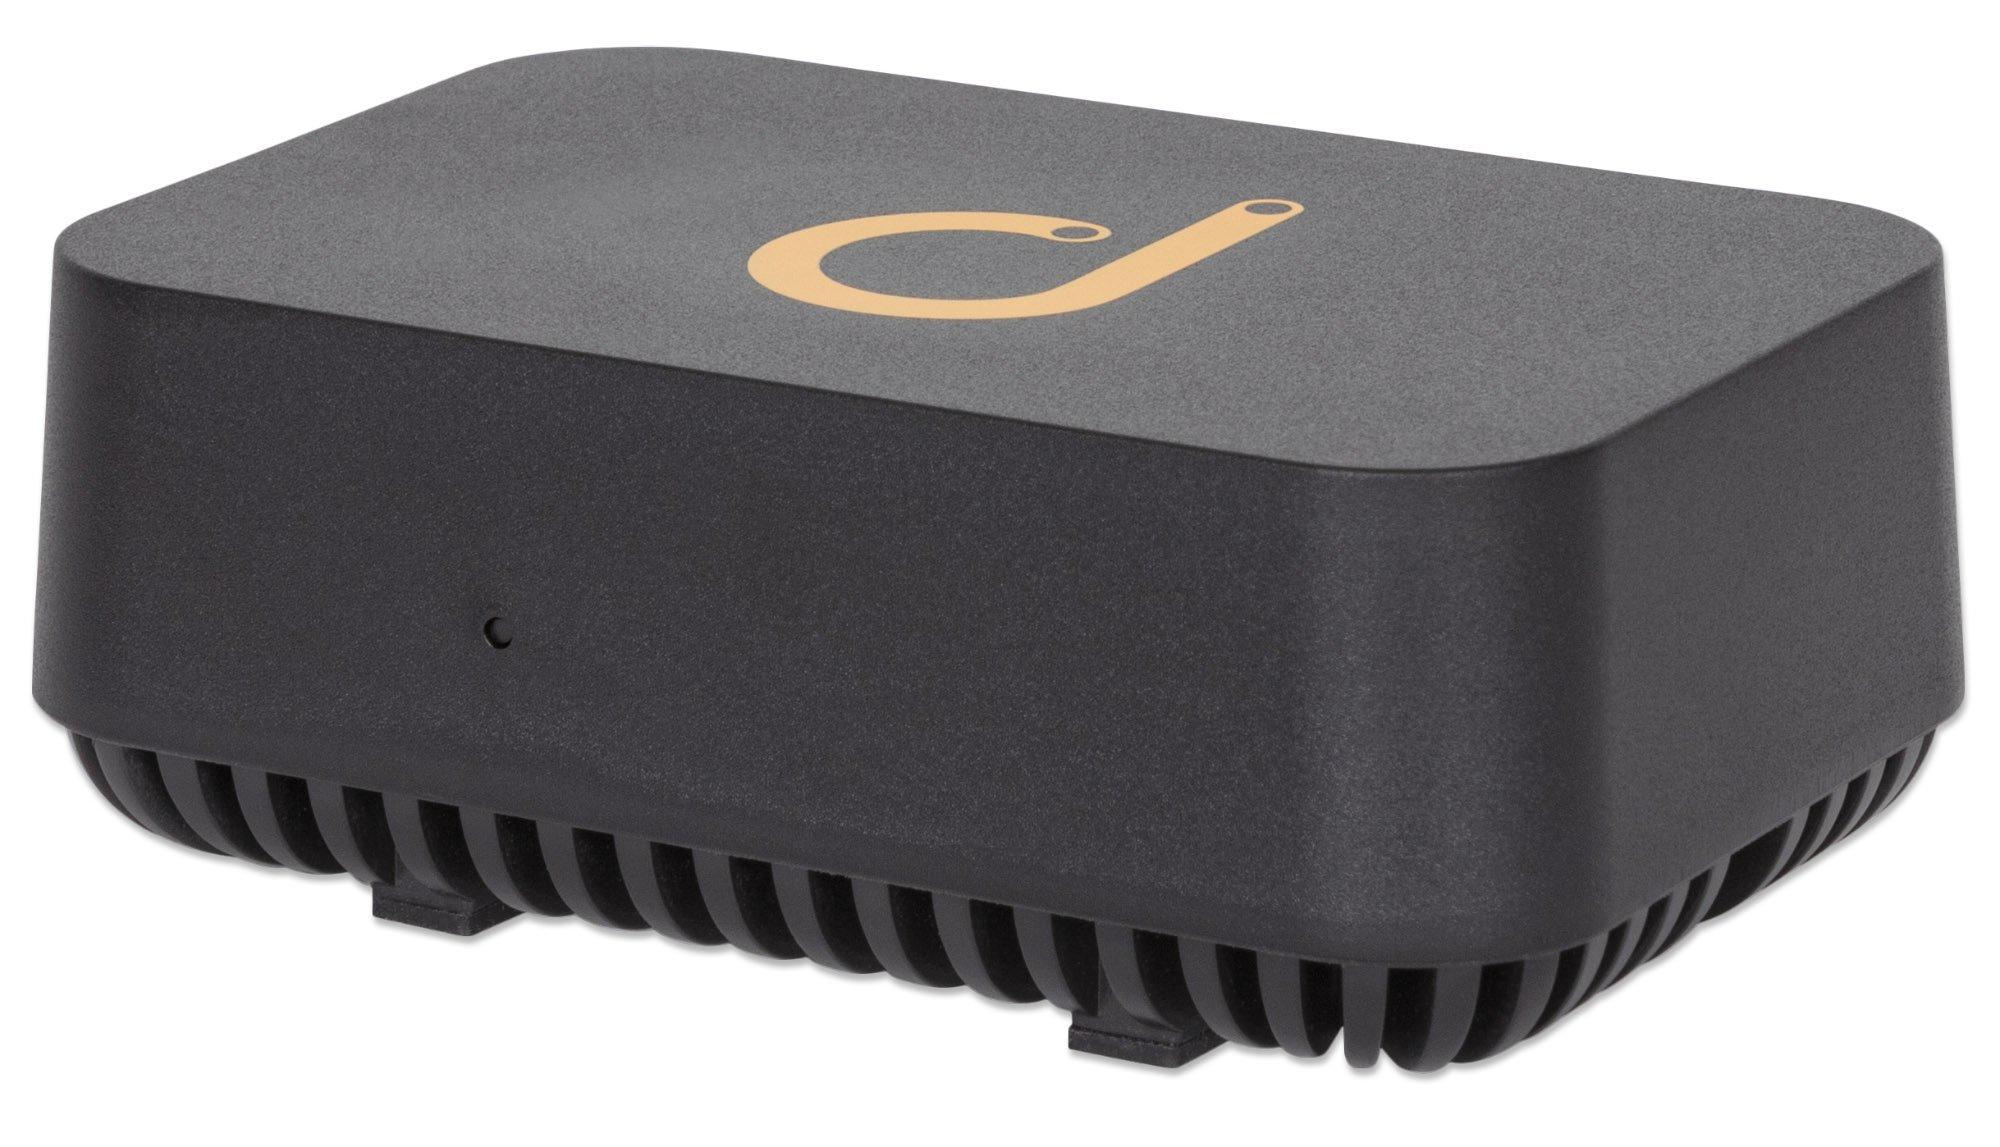 Intellinet Domotz Pro Box - IEEE 802.3ab,IEEE 802.3i,IEEE 802.3u - Verkabelt - 10 W - 100 - 240 V - 50 - 60 Hz - 0.5 A